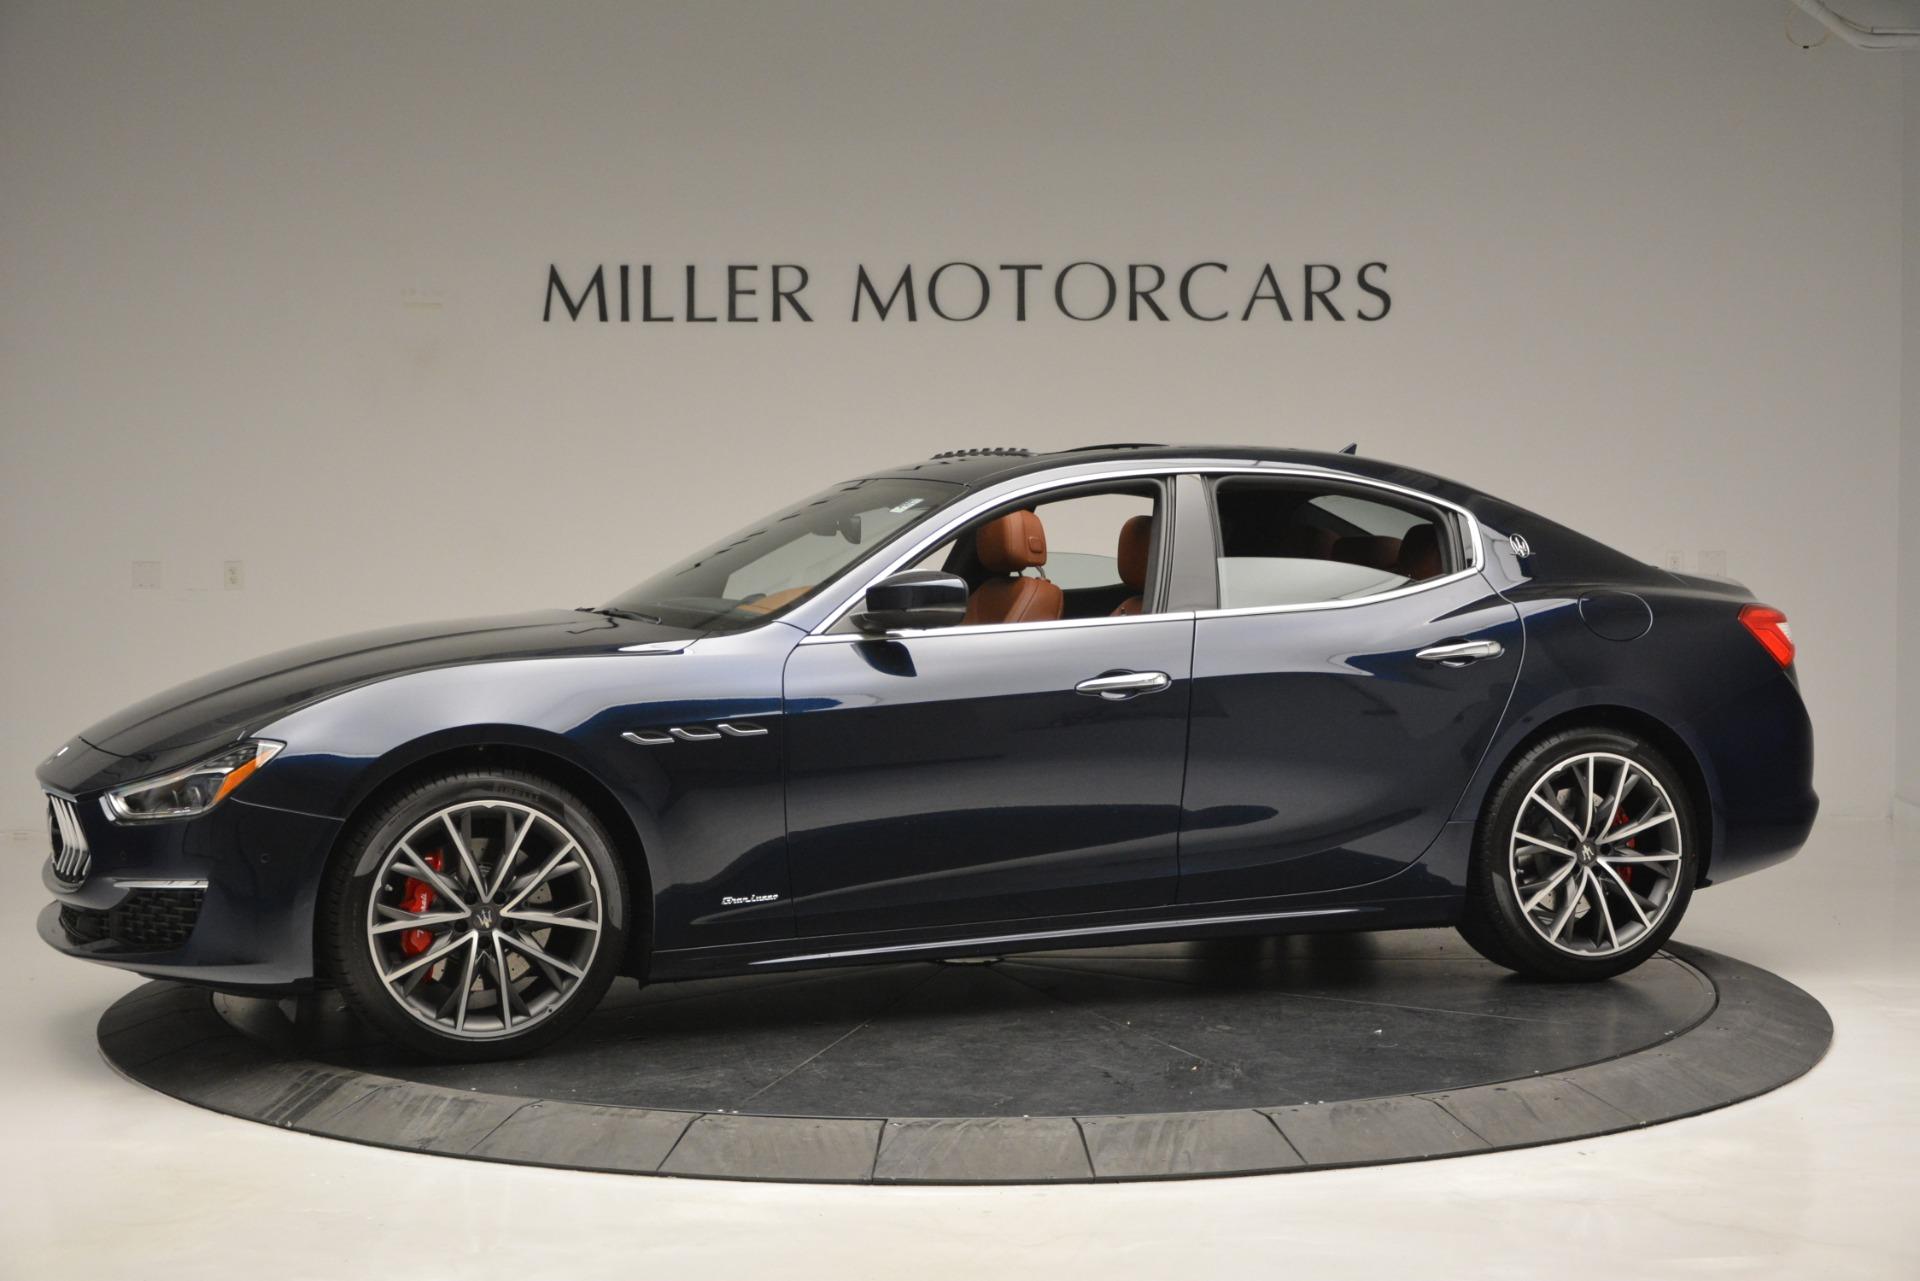 New 2019 Maserati Ghibli S Q4 GranSport For Sale In Greenwich, CT 2948_p3